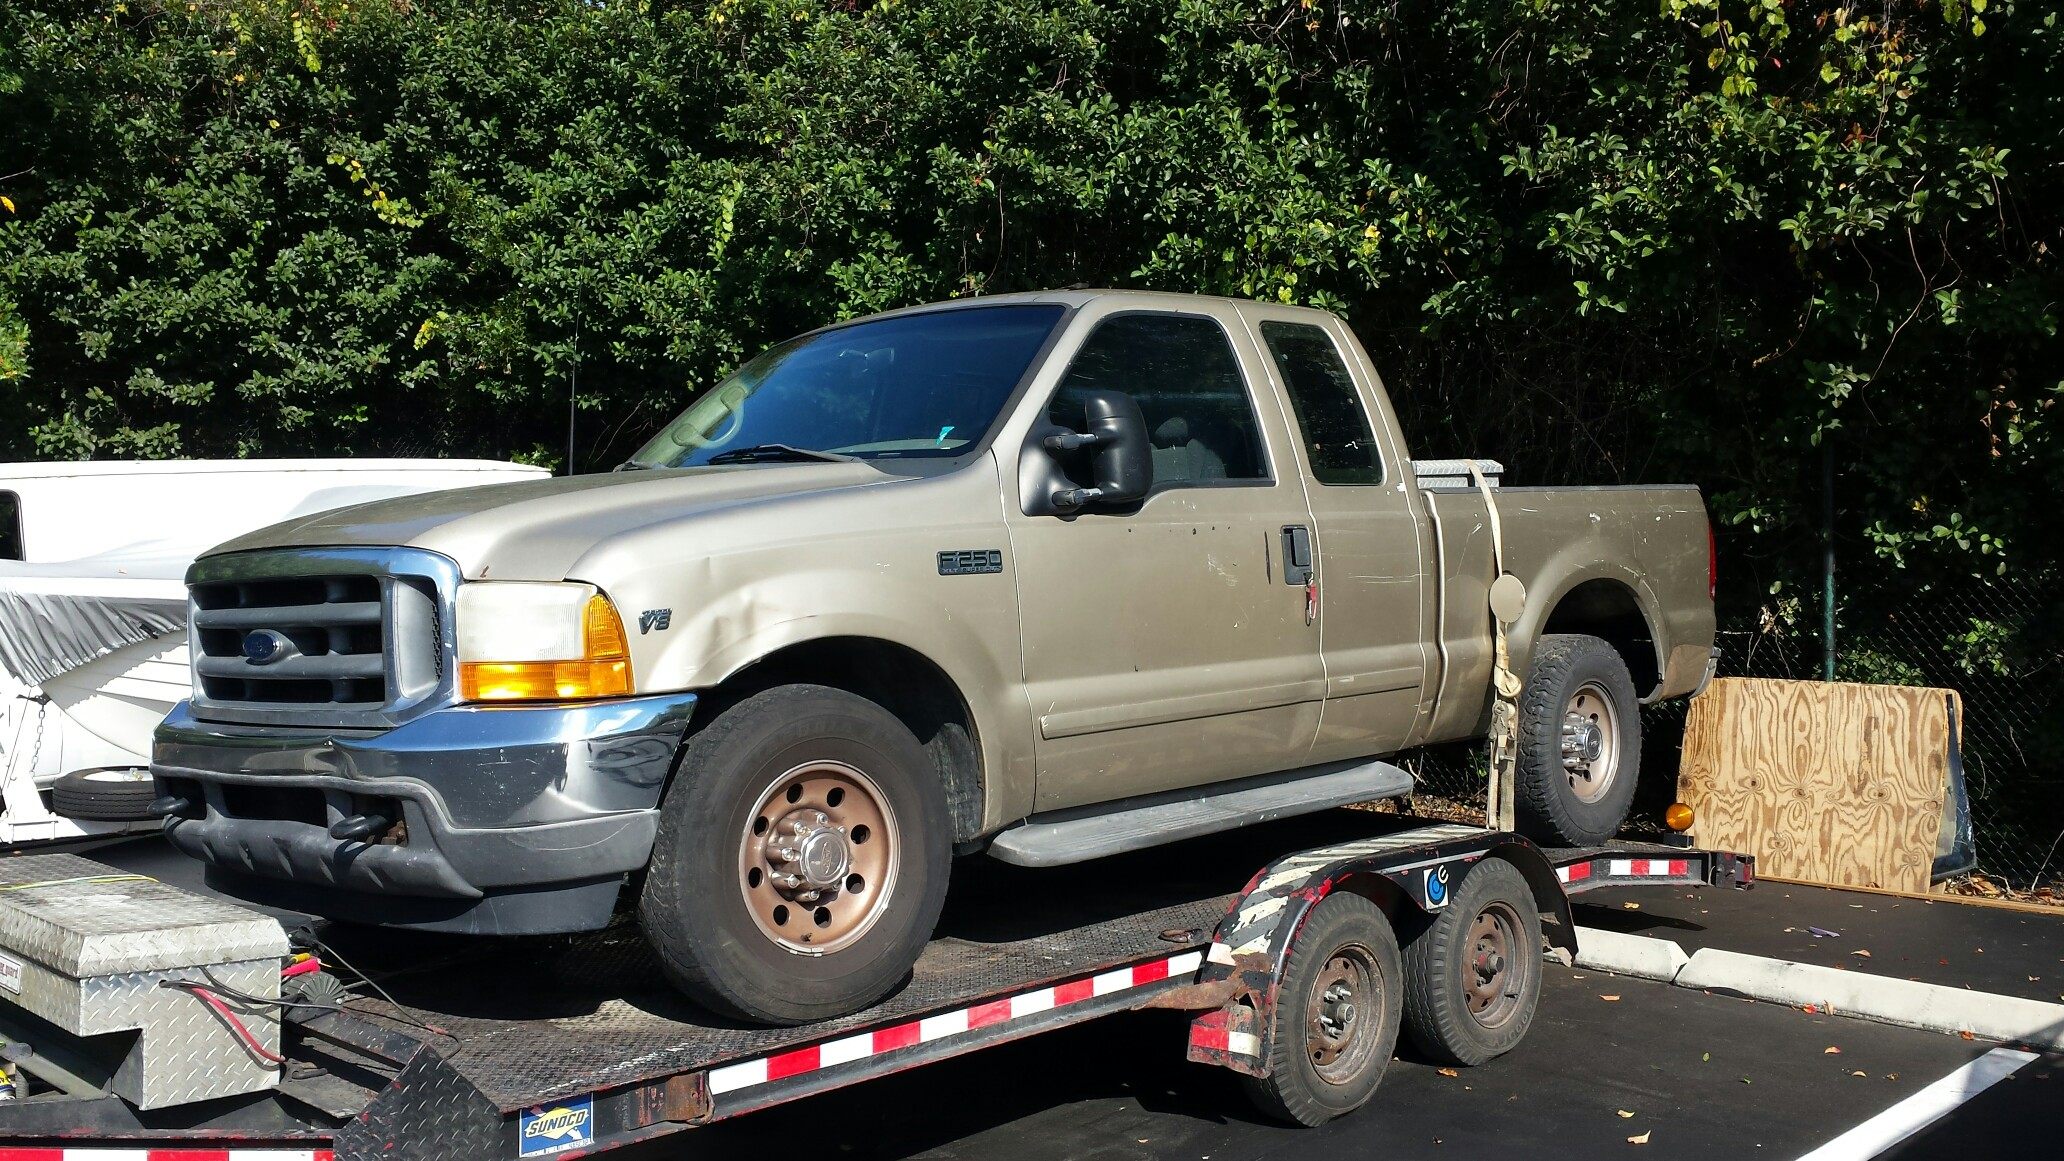 Junk Cars Orlando, No Keys/Title? No Problem! Free Towing & Removal!